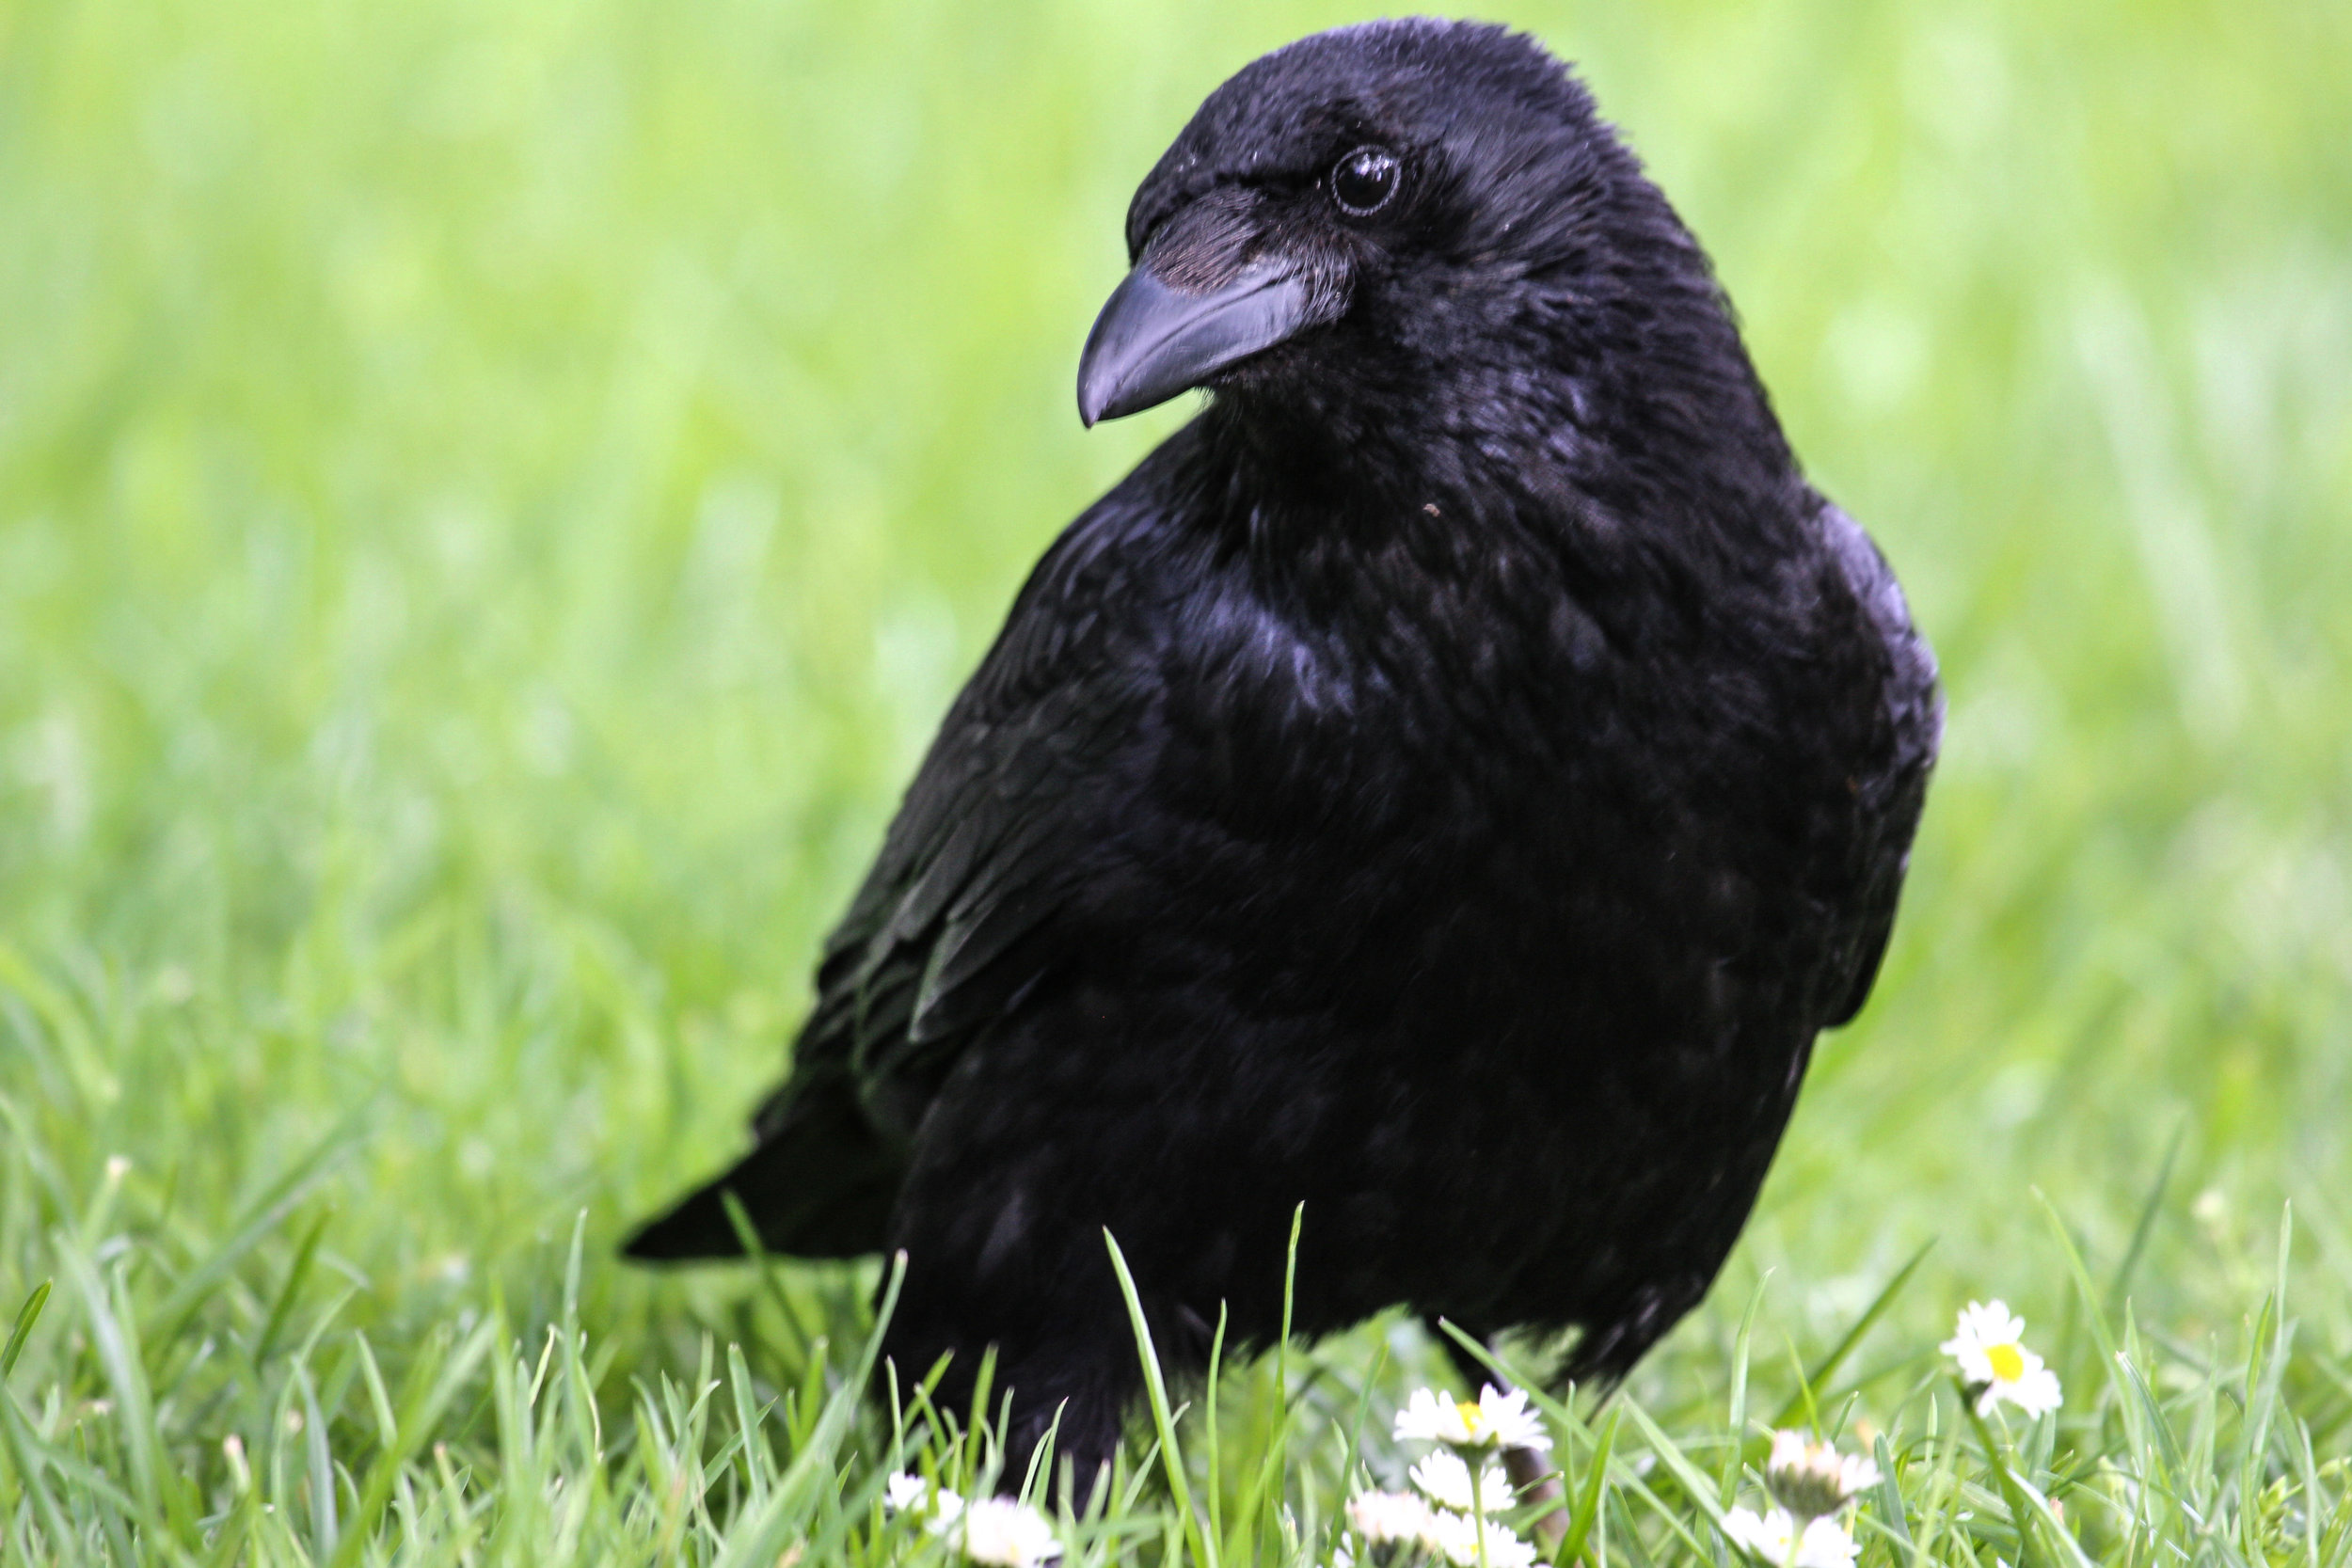 london hyde park bird raven (1 of 1).jpg